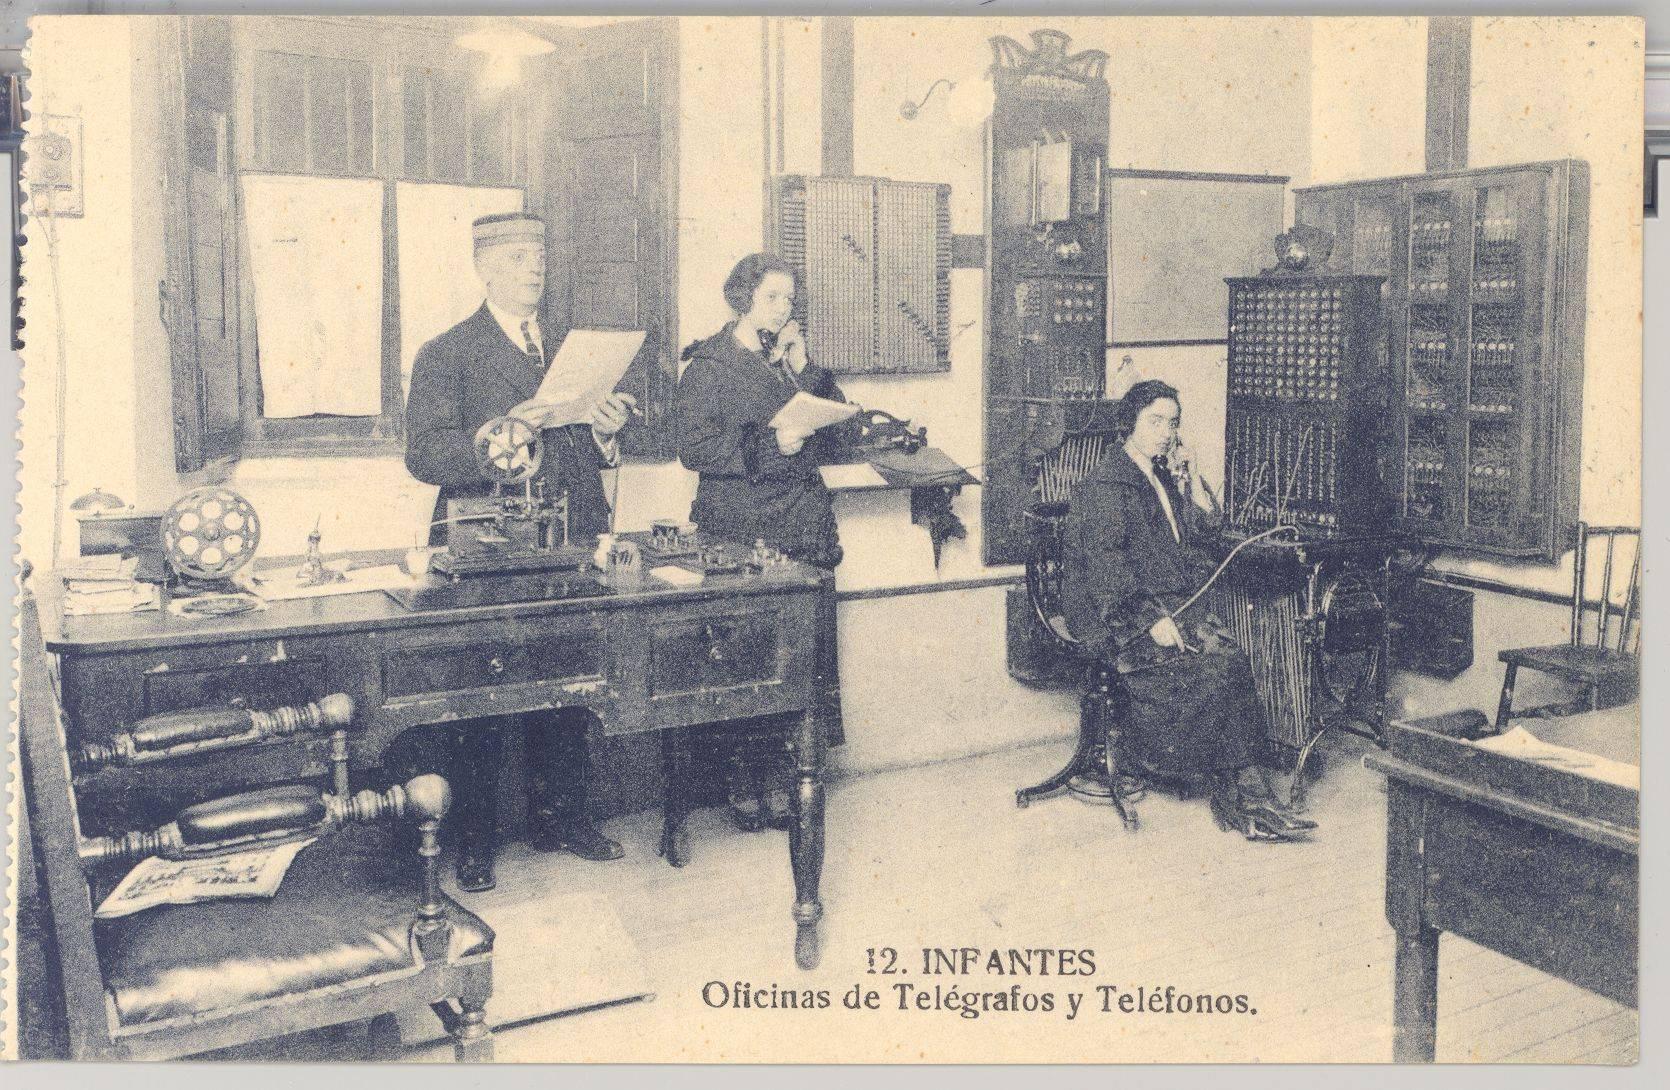 Infantes, Oficinas de telégrafos y teléfonos